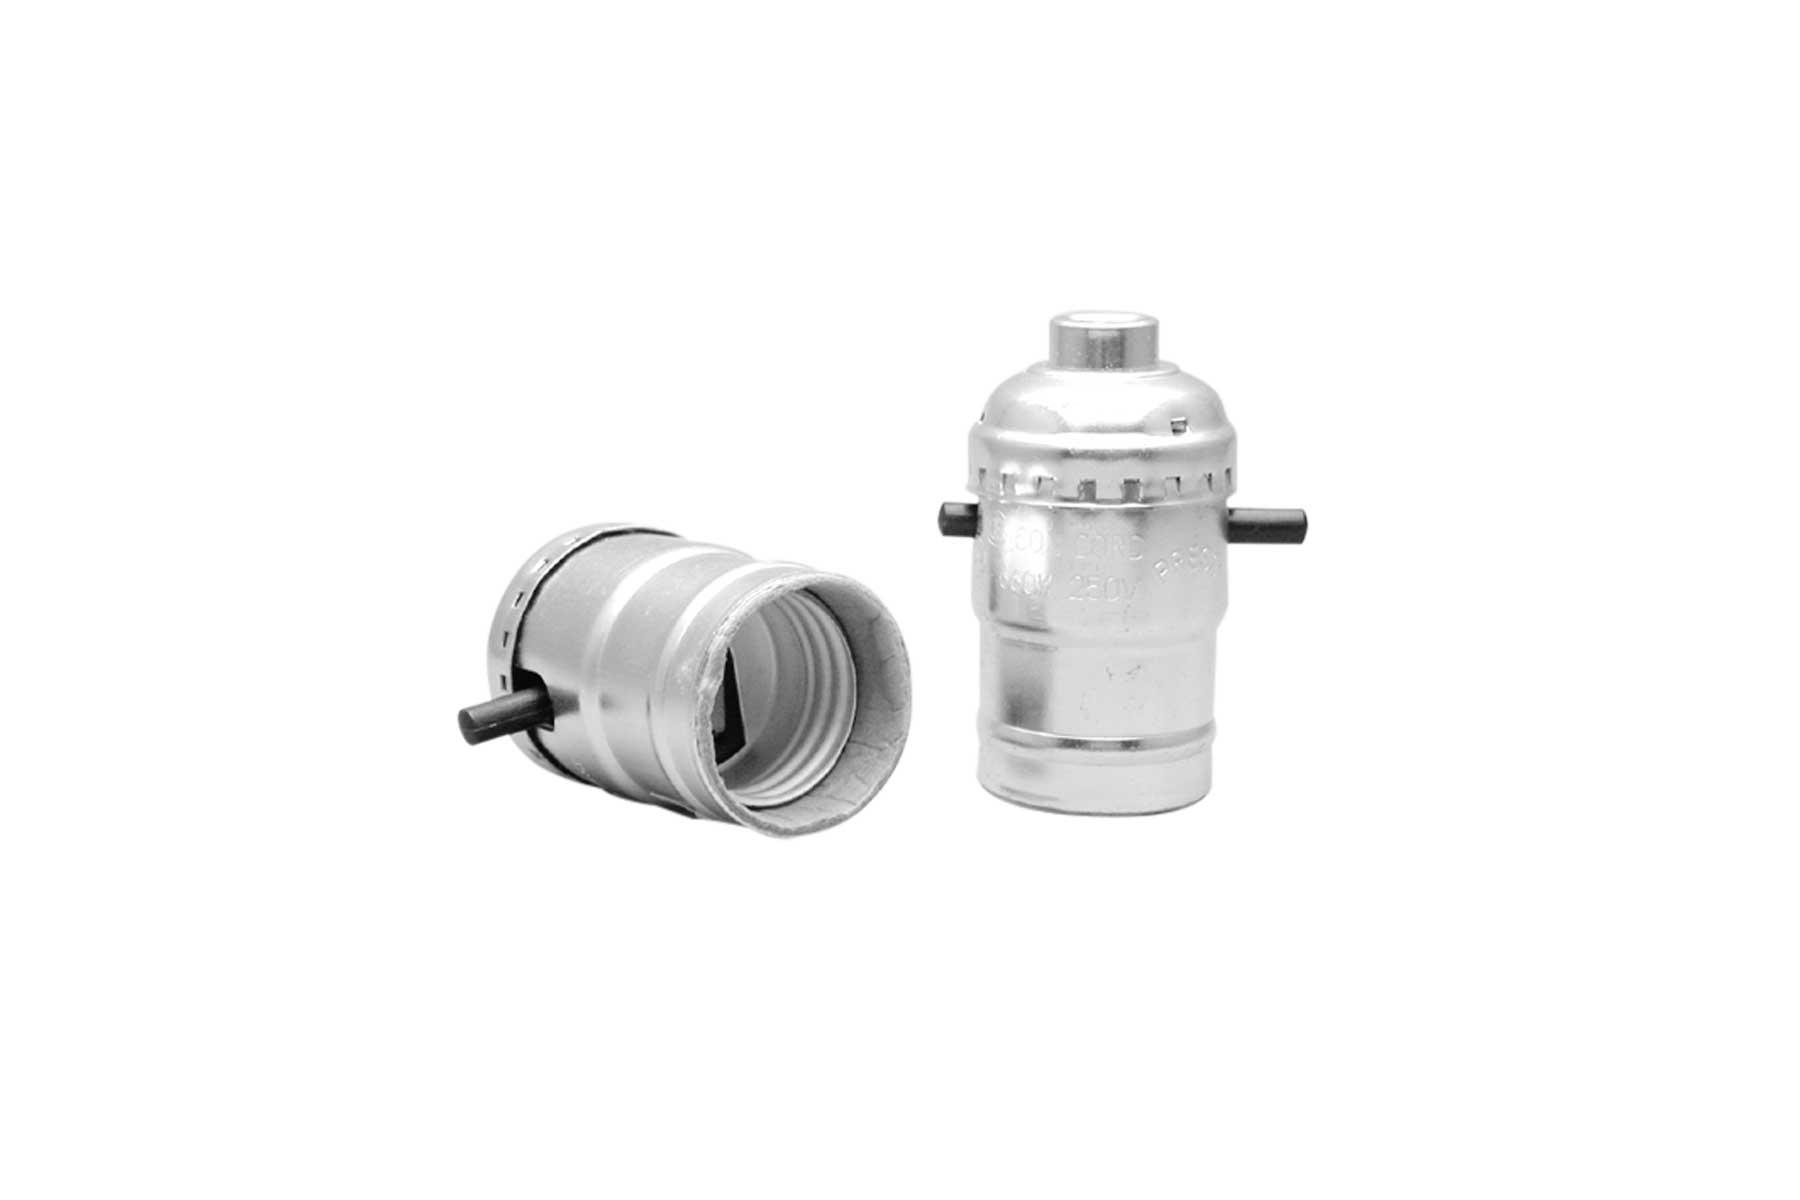 Metal Shell Medium Base Push Thru Electrolier Screw Terminal Incandescent Light Socket